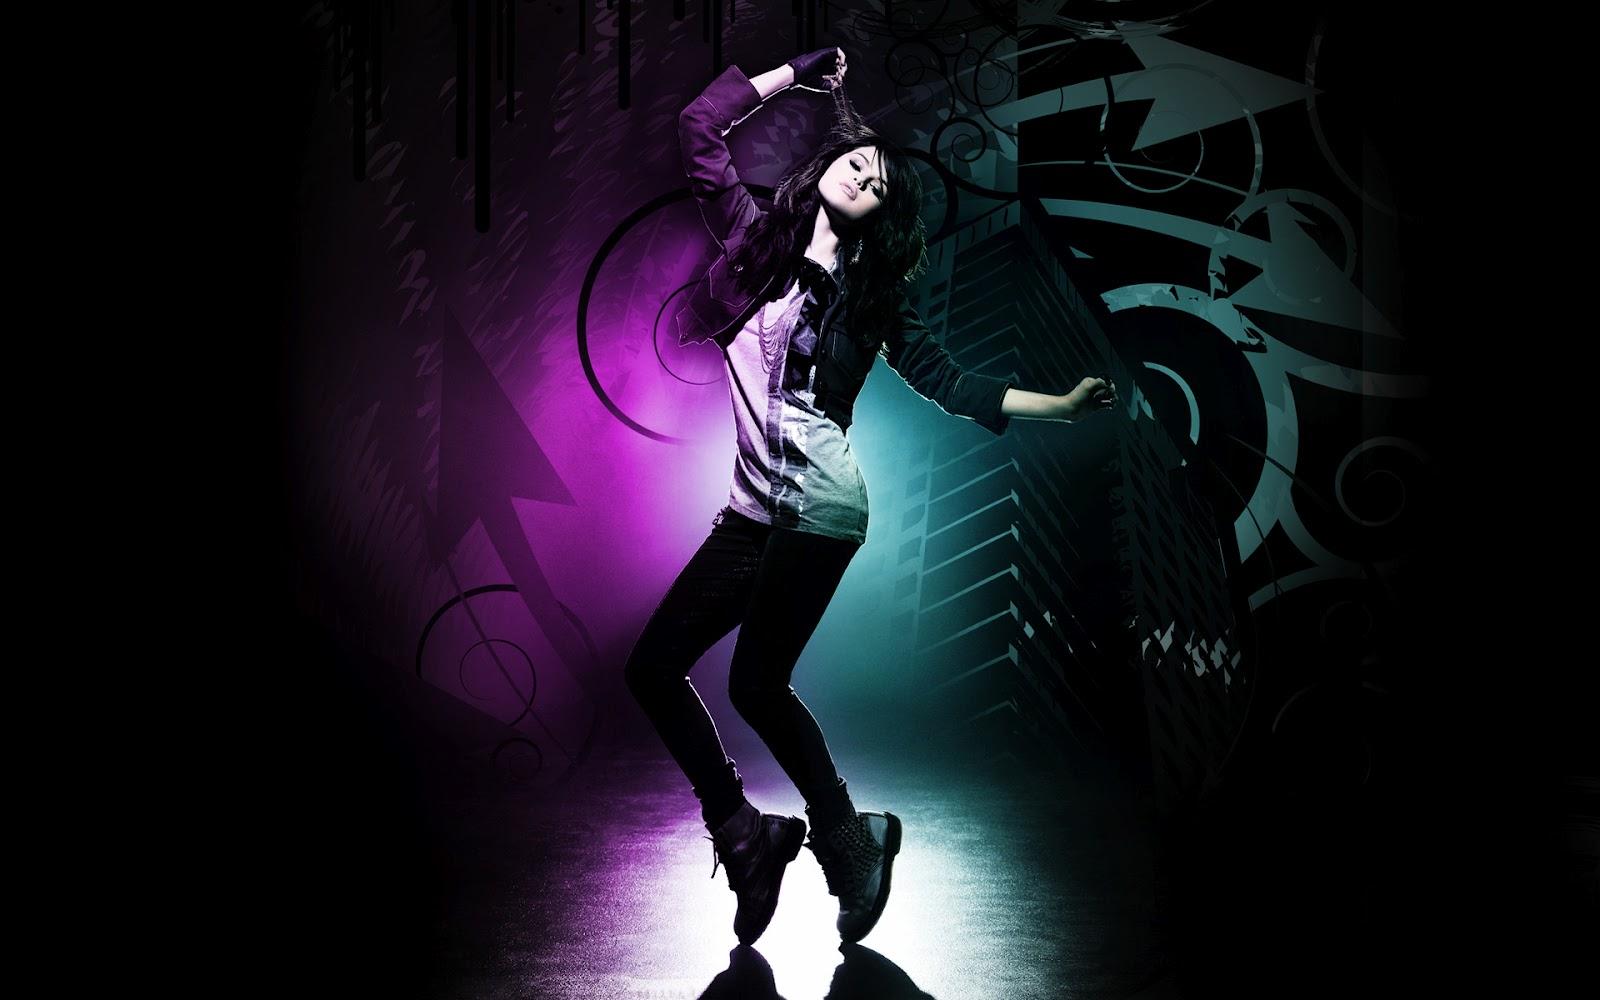 Selena Gomez Dancing   Fondos de Pantalla HD   Wallpapers HD 1600x1000